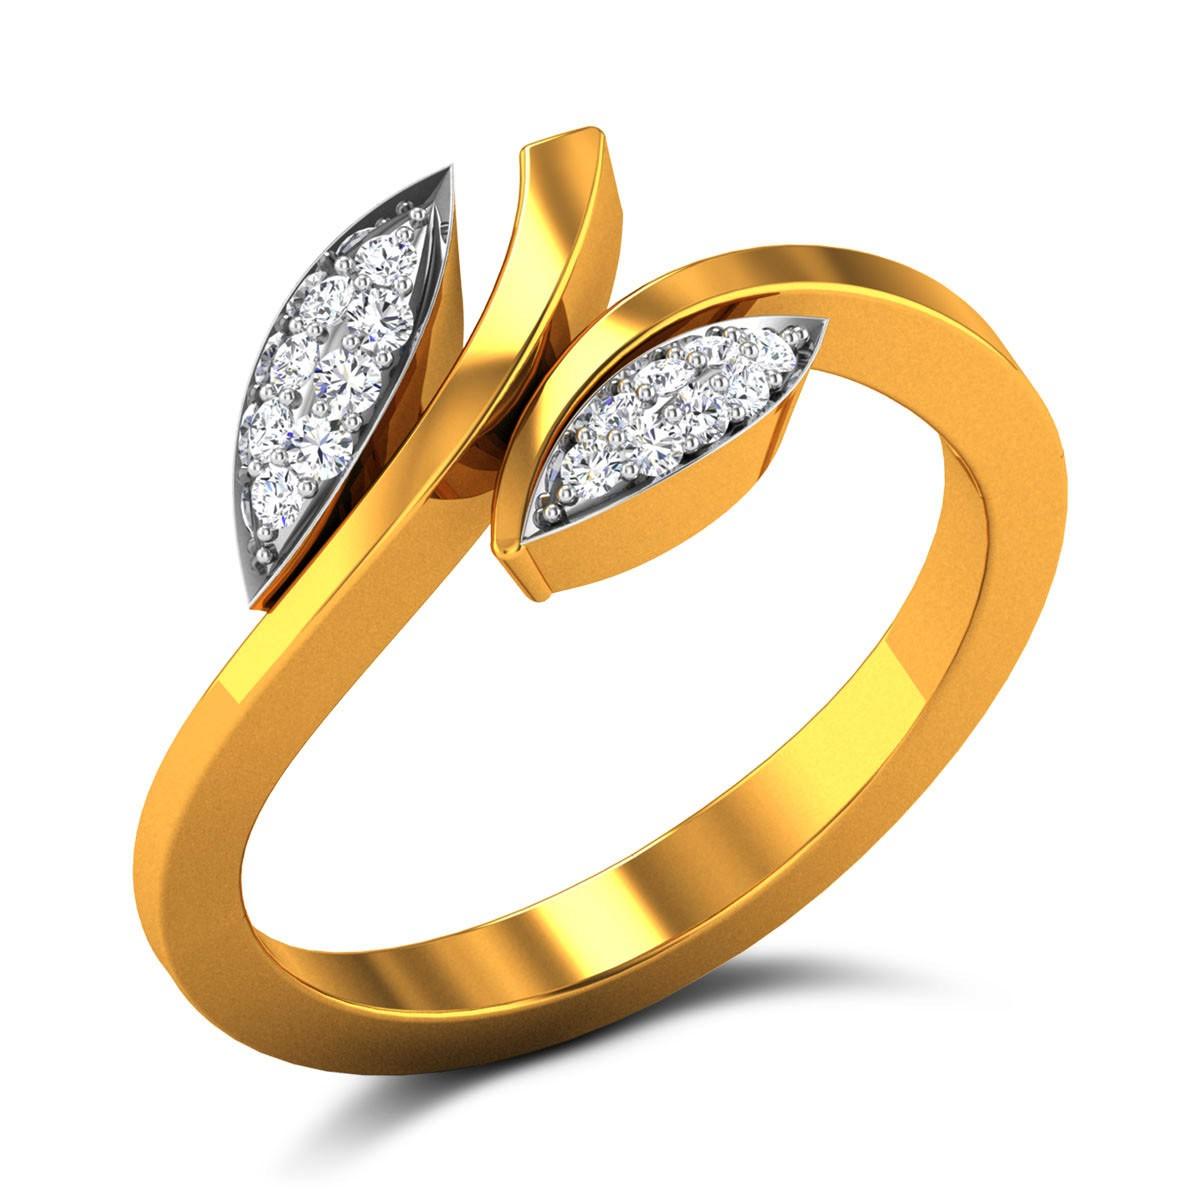 Ethan Diamond Ring